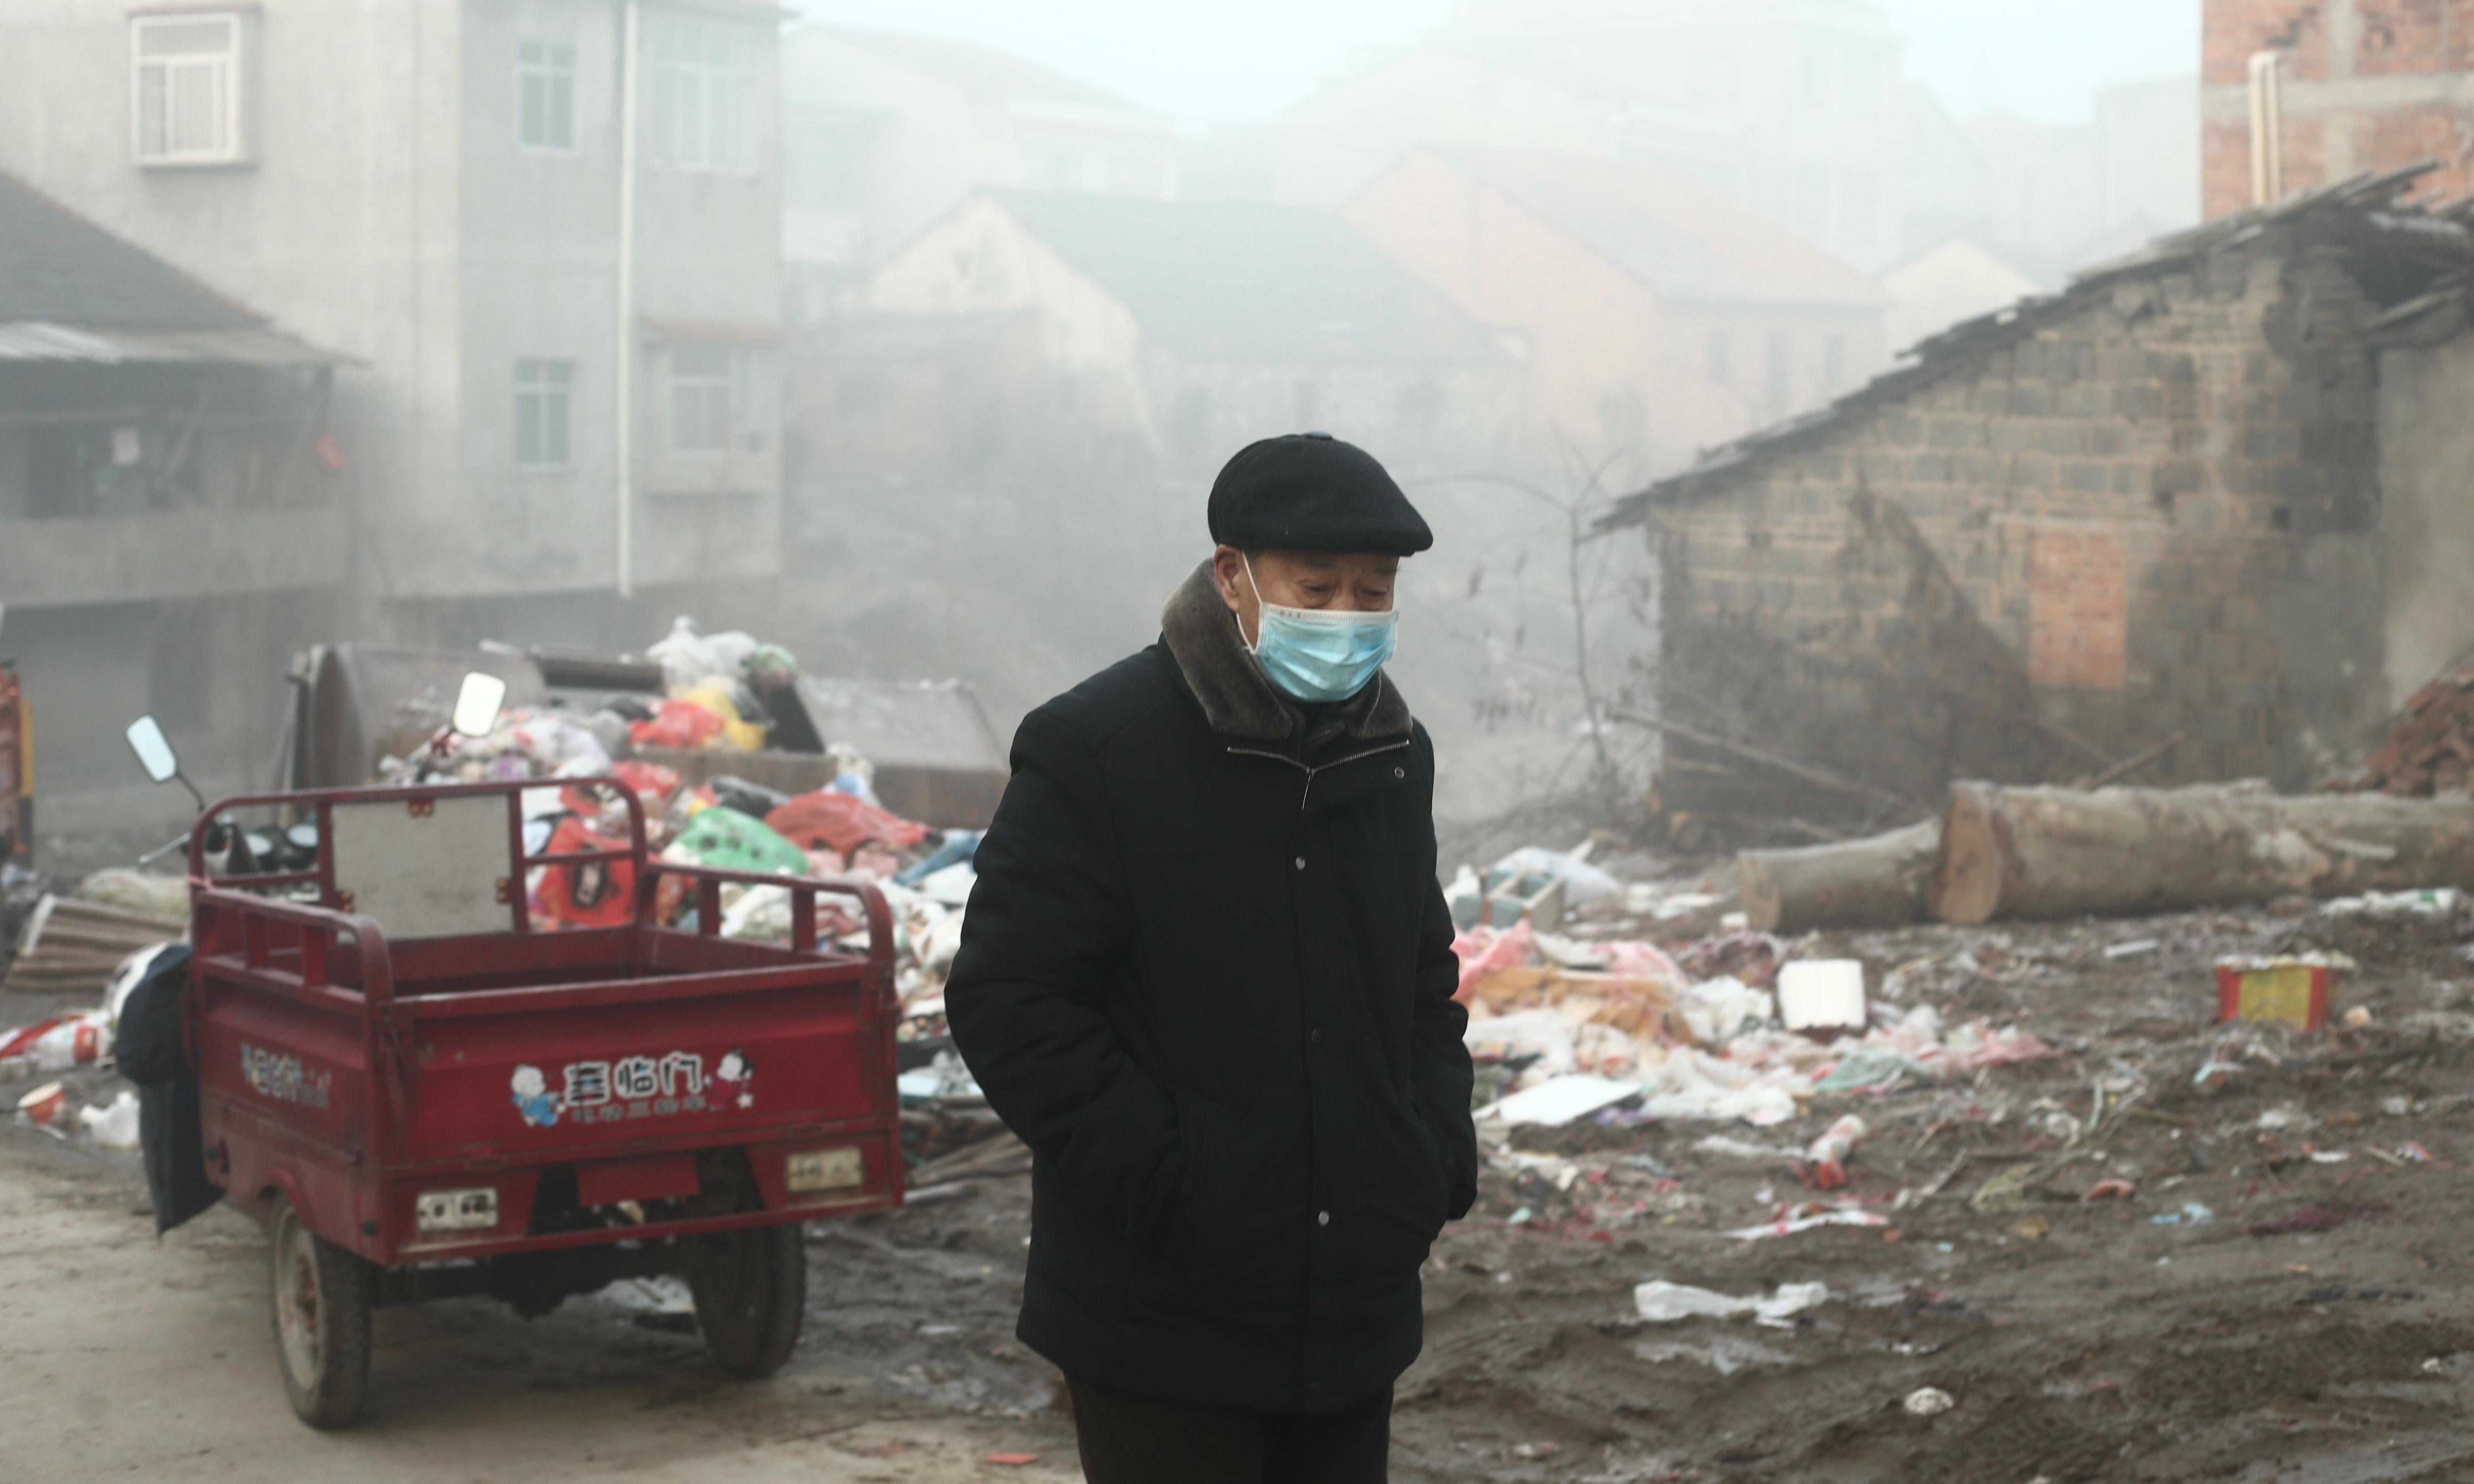 China's reaction to the coronavirus violates human rights